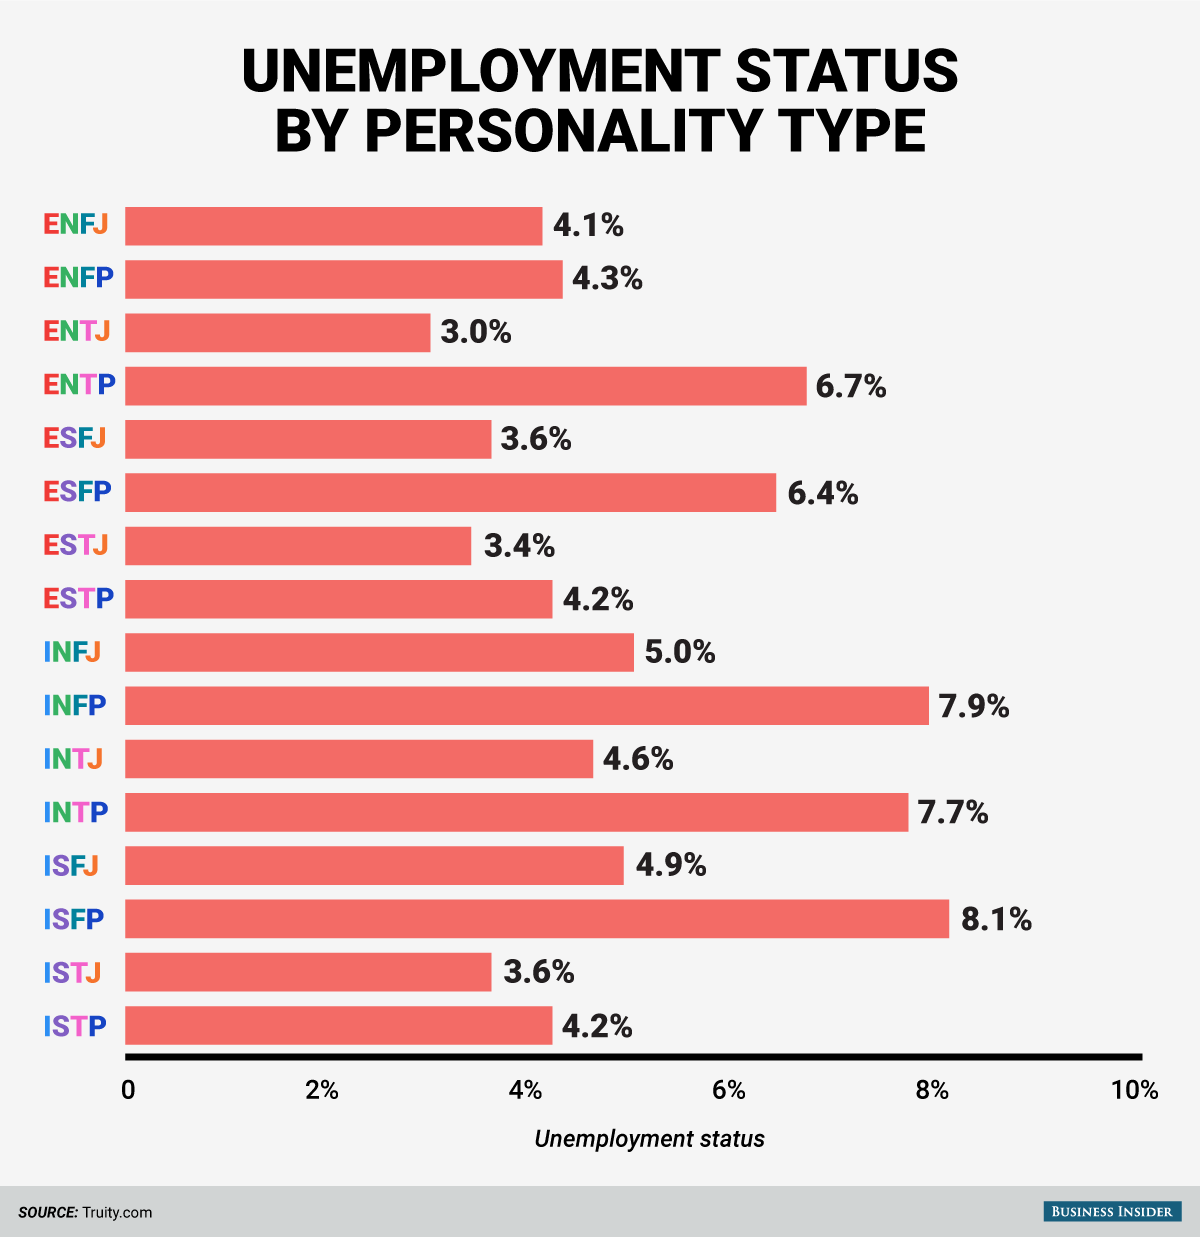 BI_Graphics_.Personality types unemployment